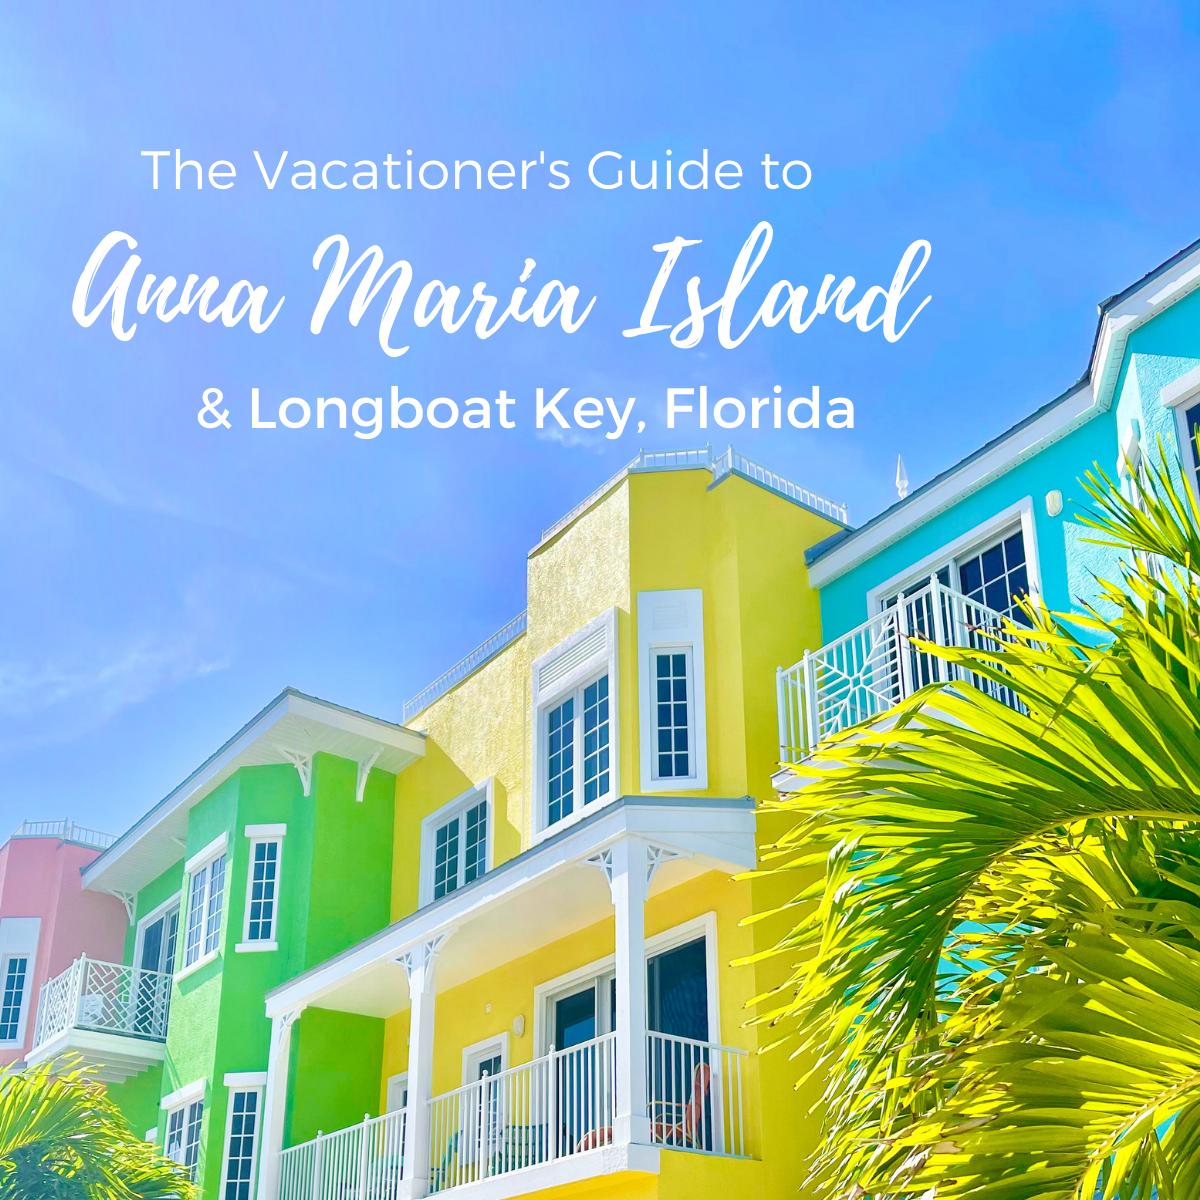 Things to Do on Longboat Key & Anna Maria Island, Florida